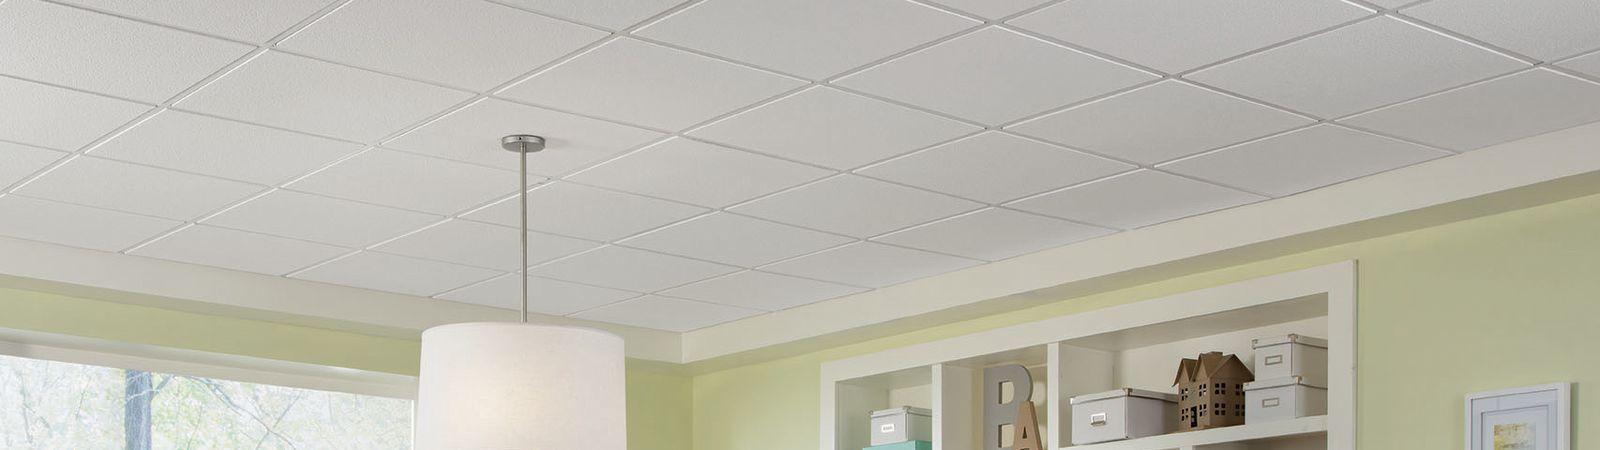 Mineral Fiber Suspended Ceiling Tile Acoustic Flame